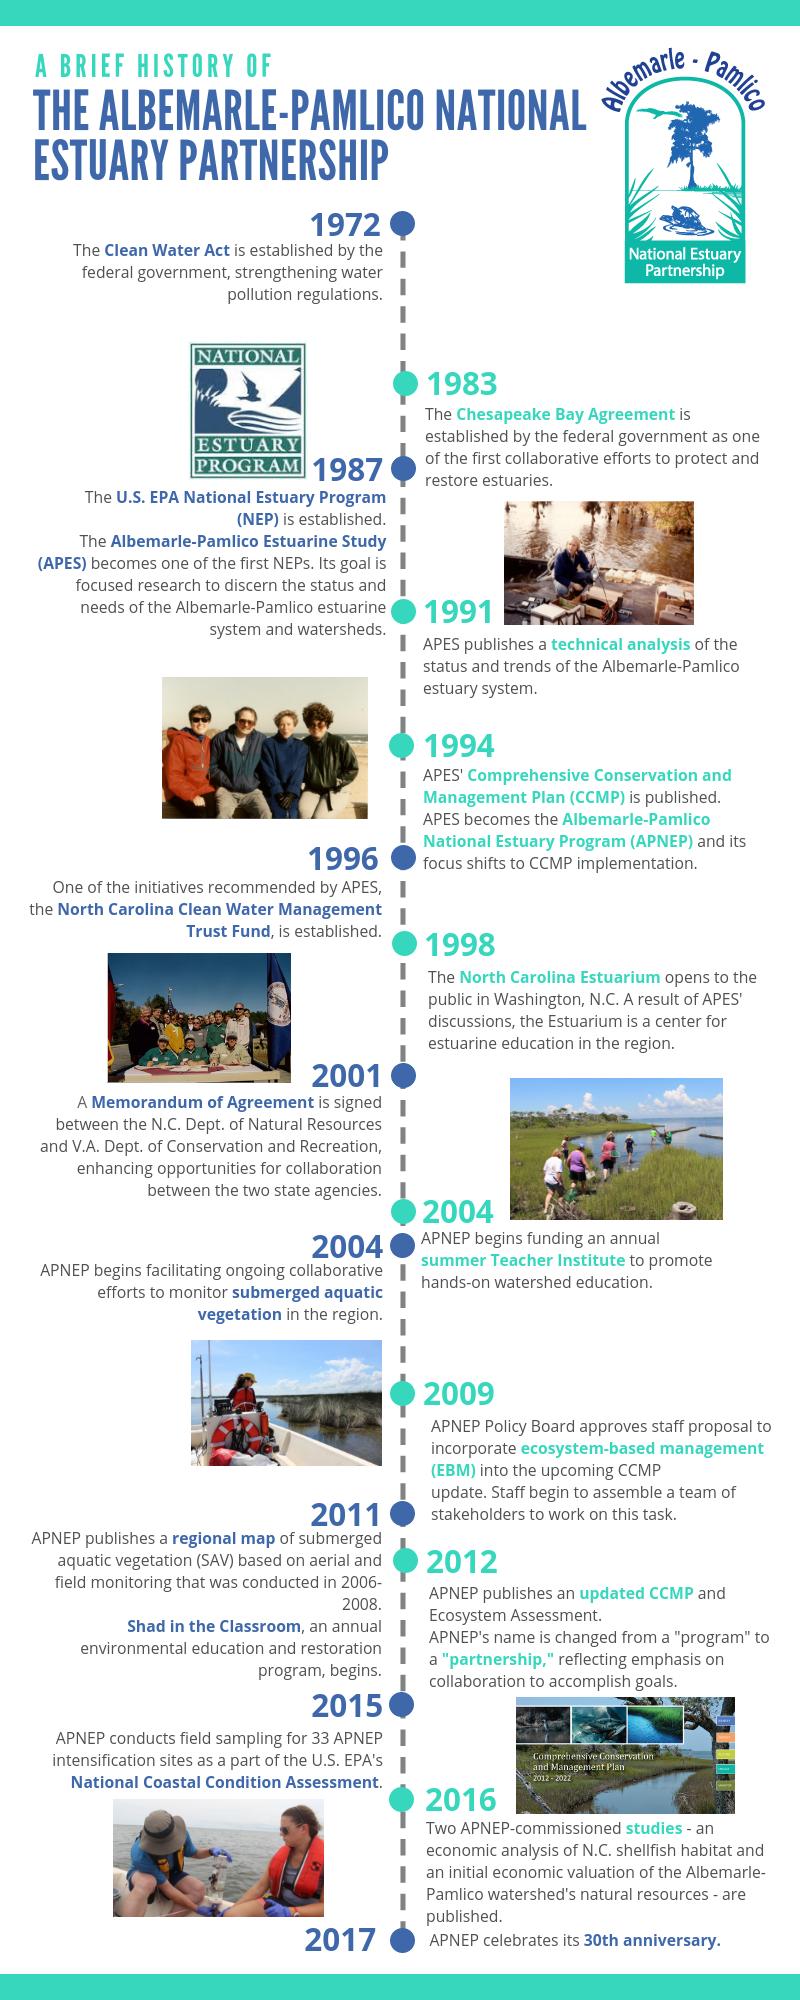 APNEP Timeline